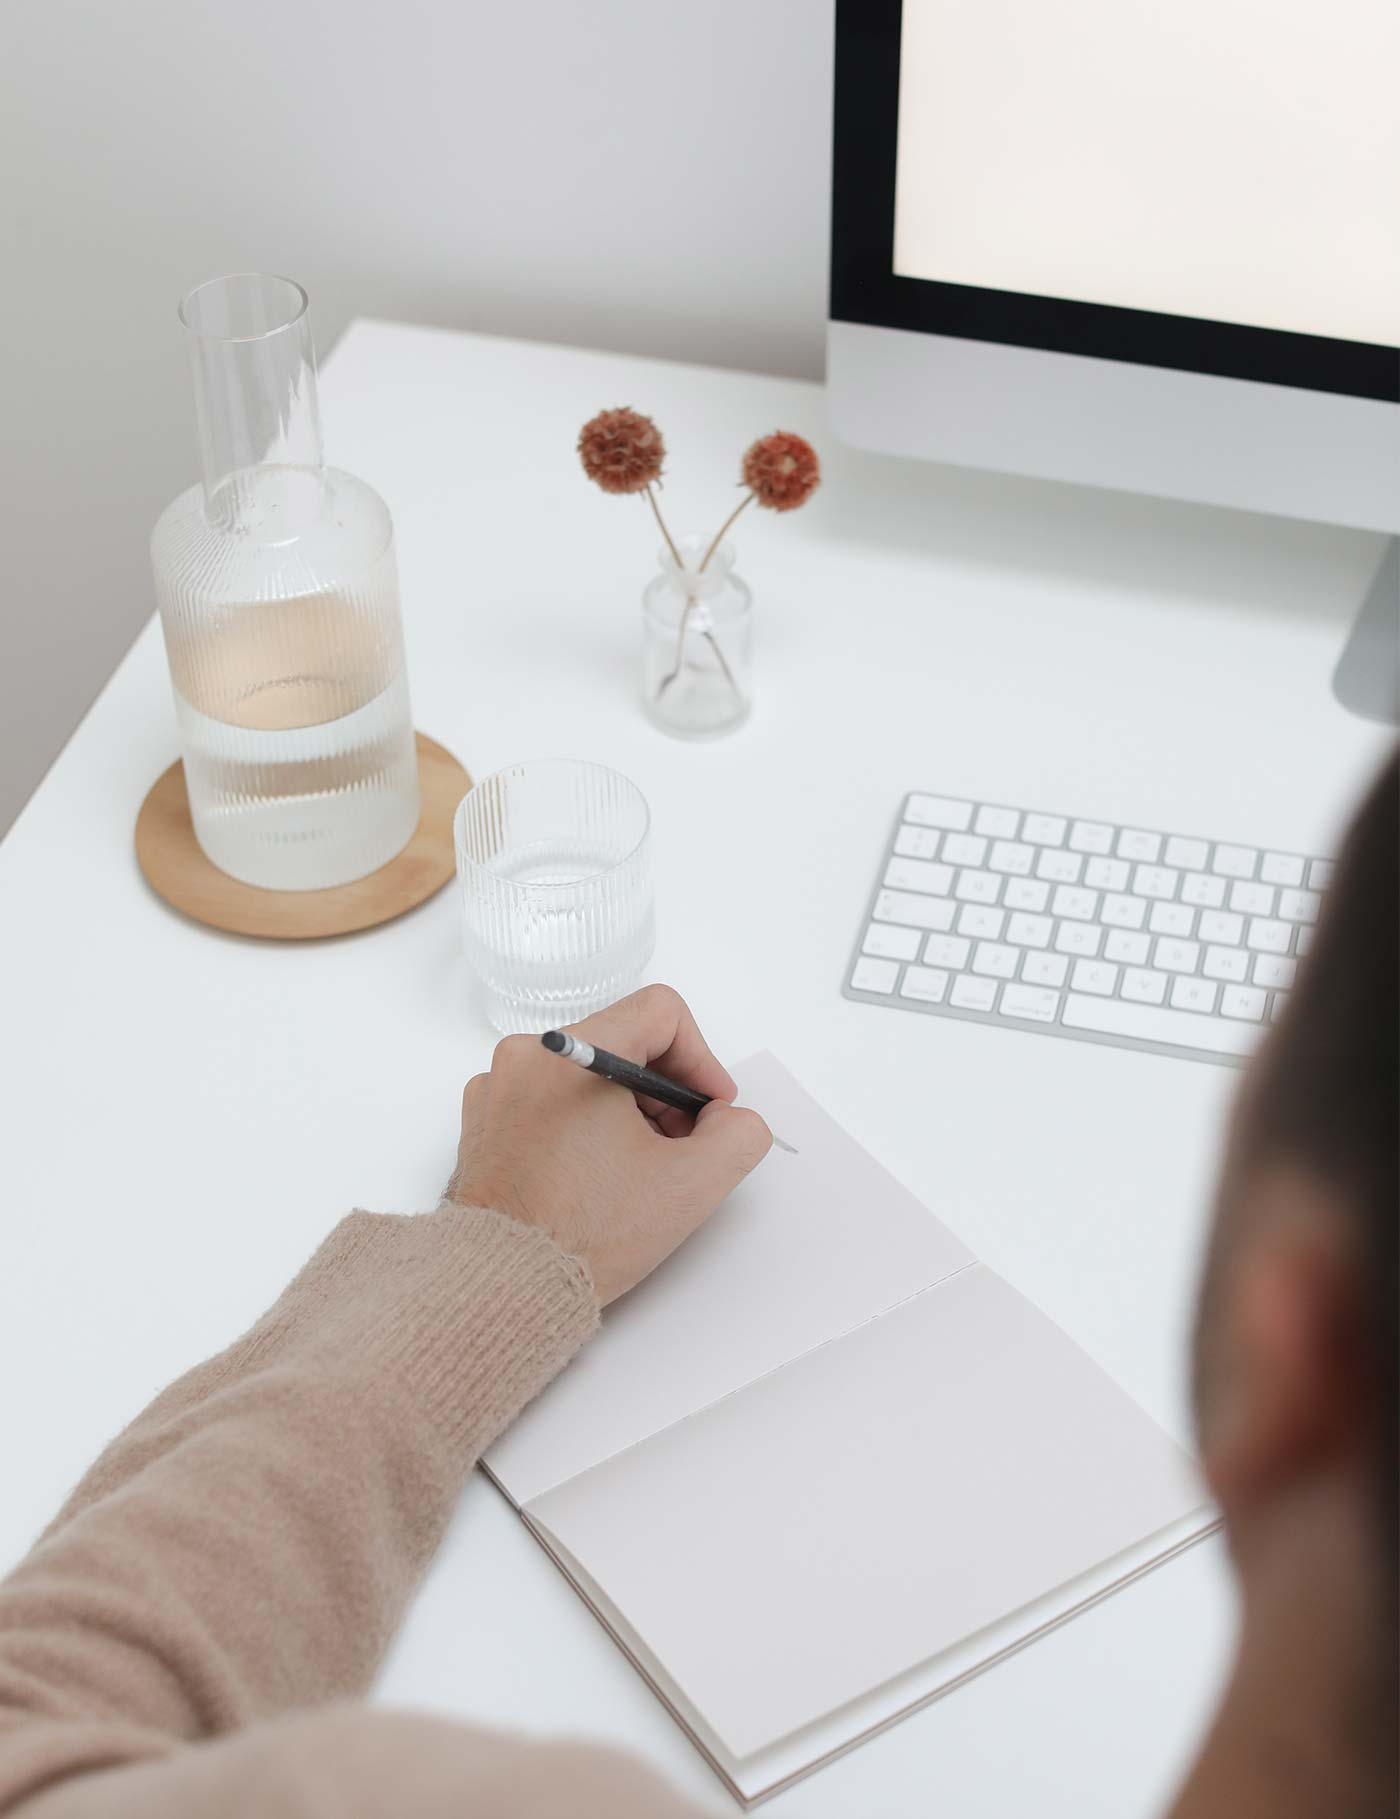 The_Designers_Wellness_Hub_15